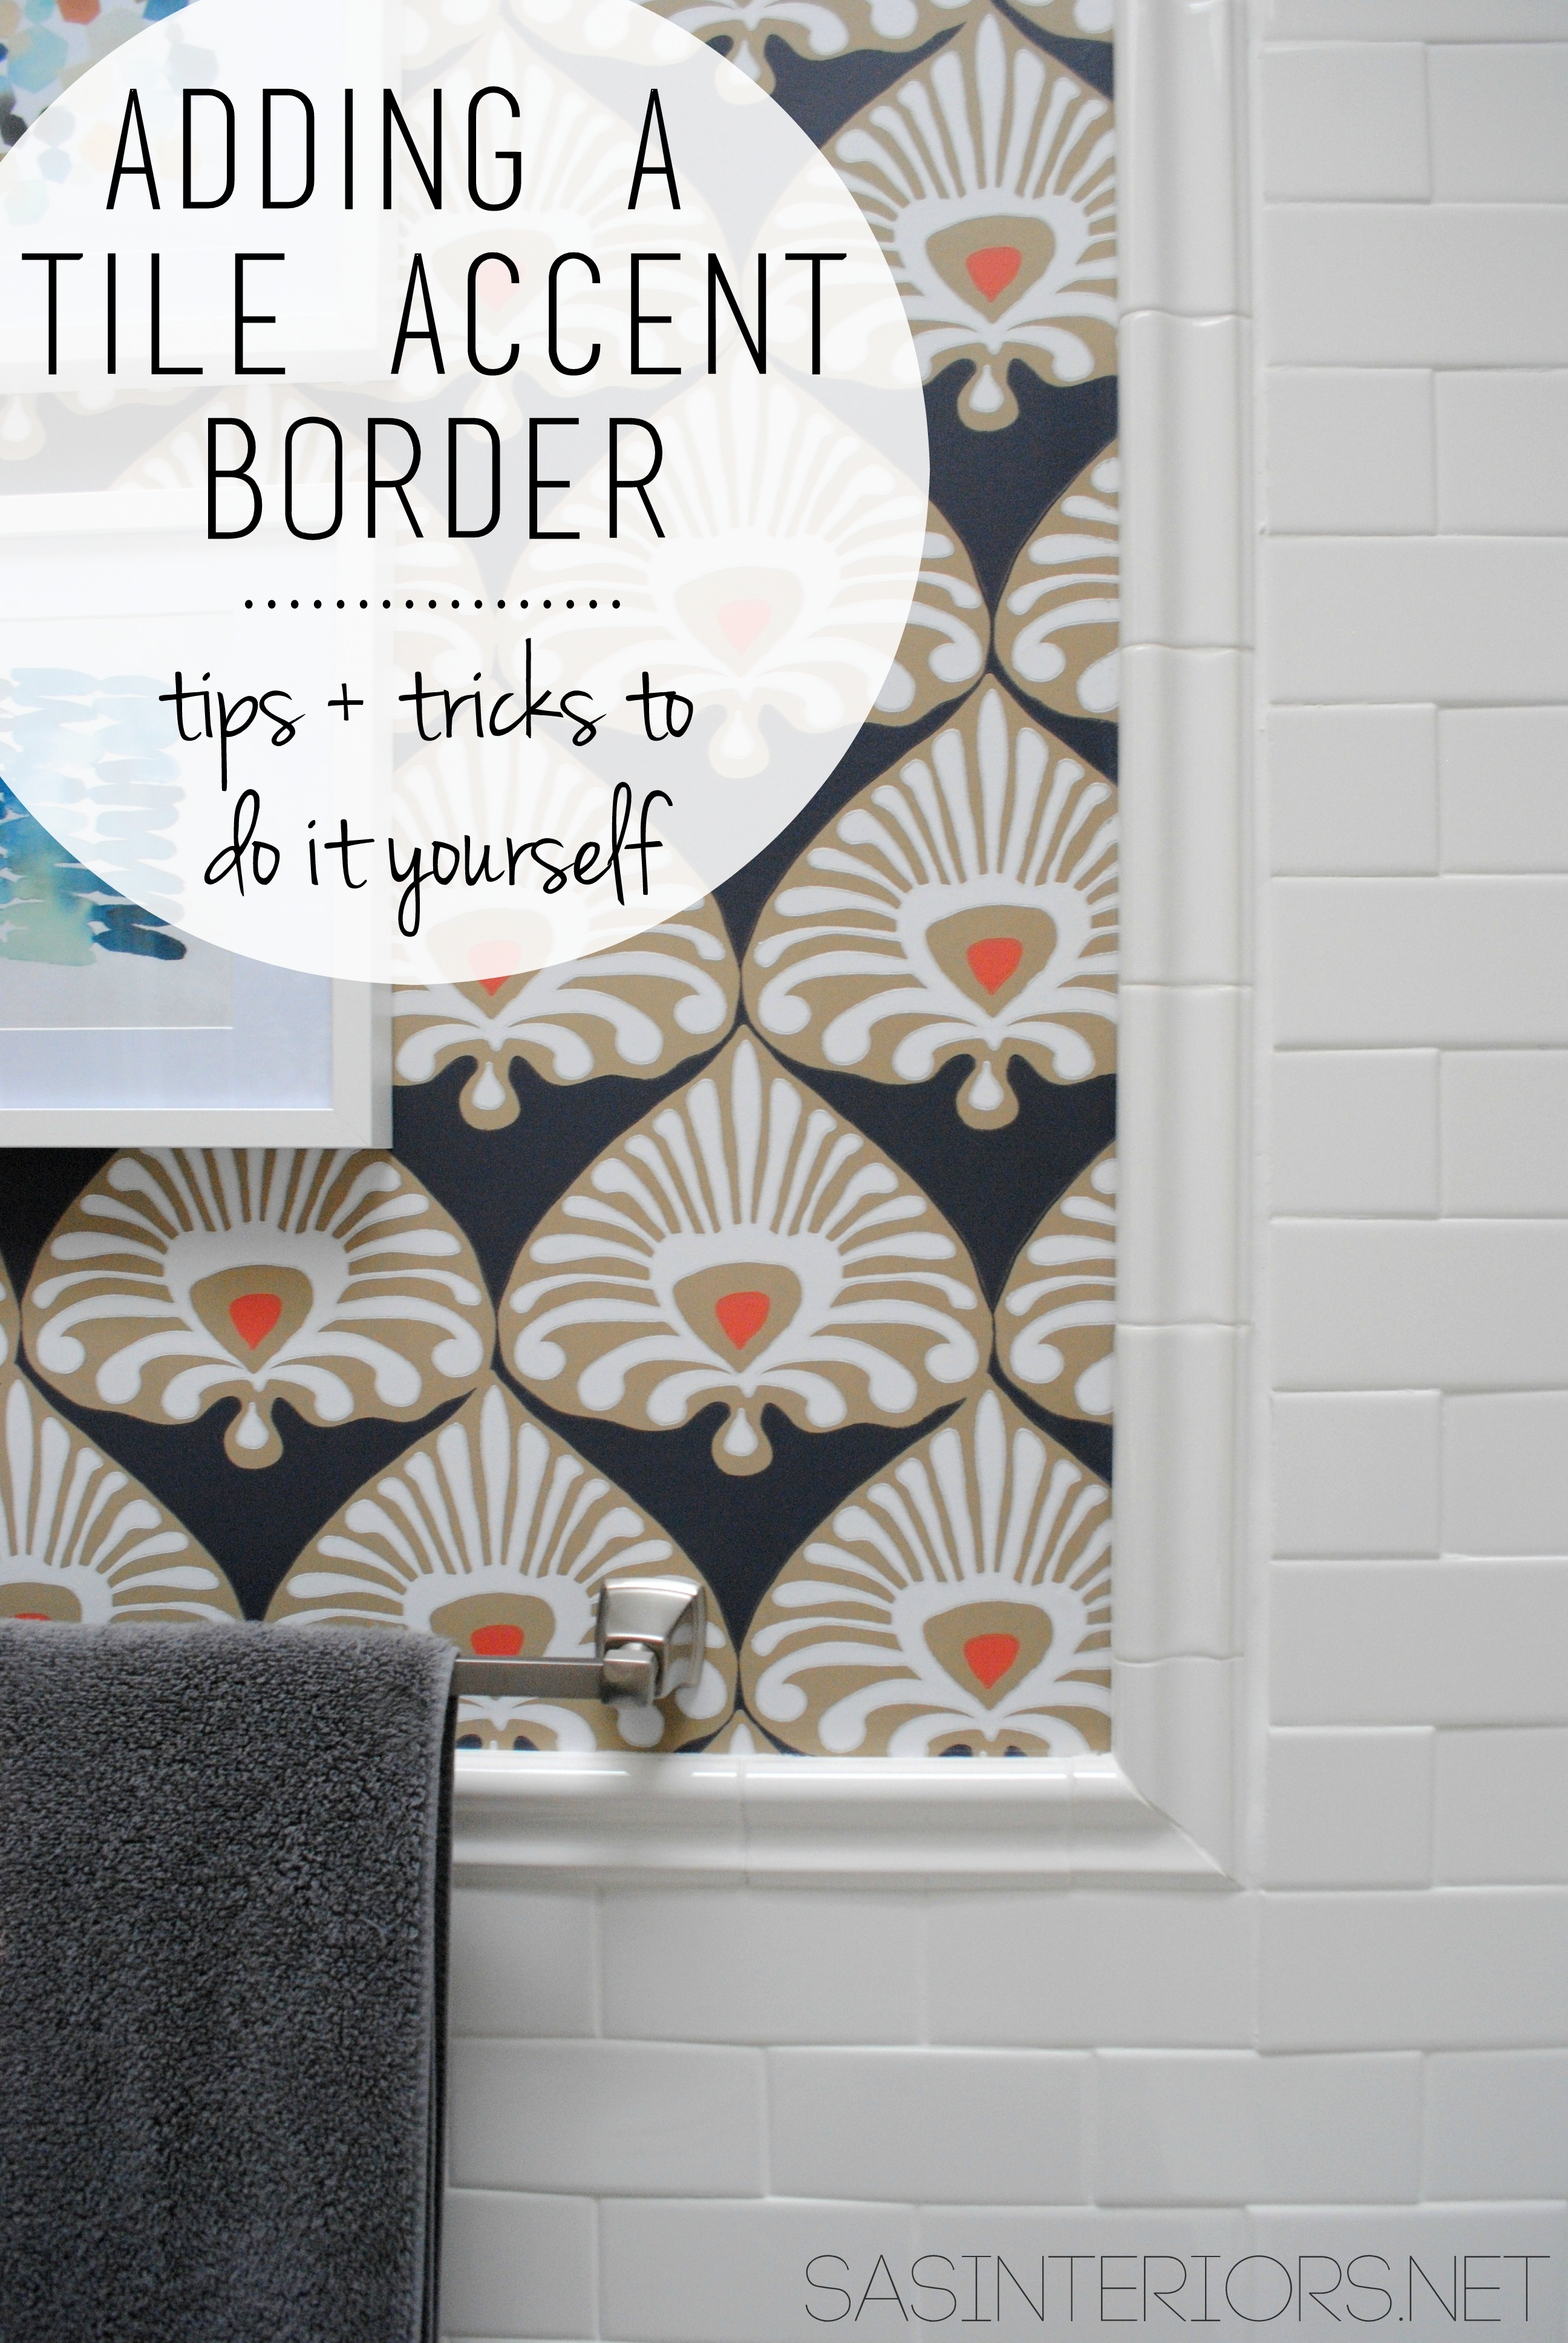 bathroom makeover tile accent border day 18 jenna burger design llc